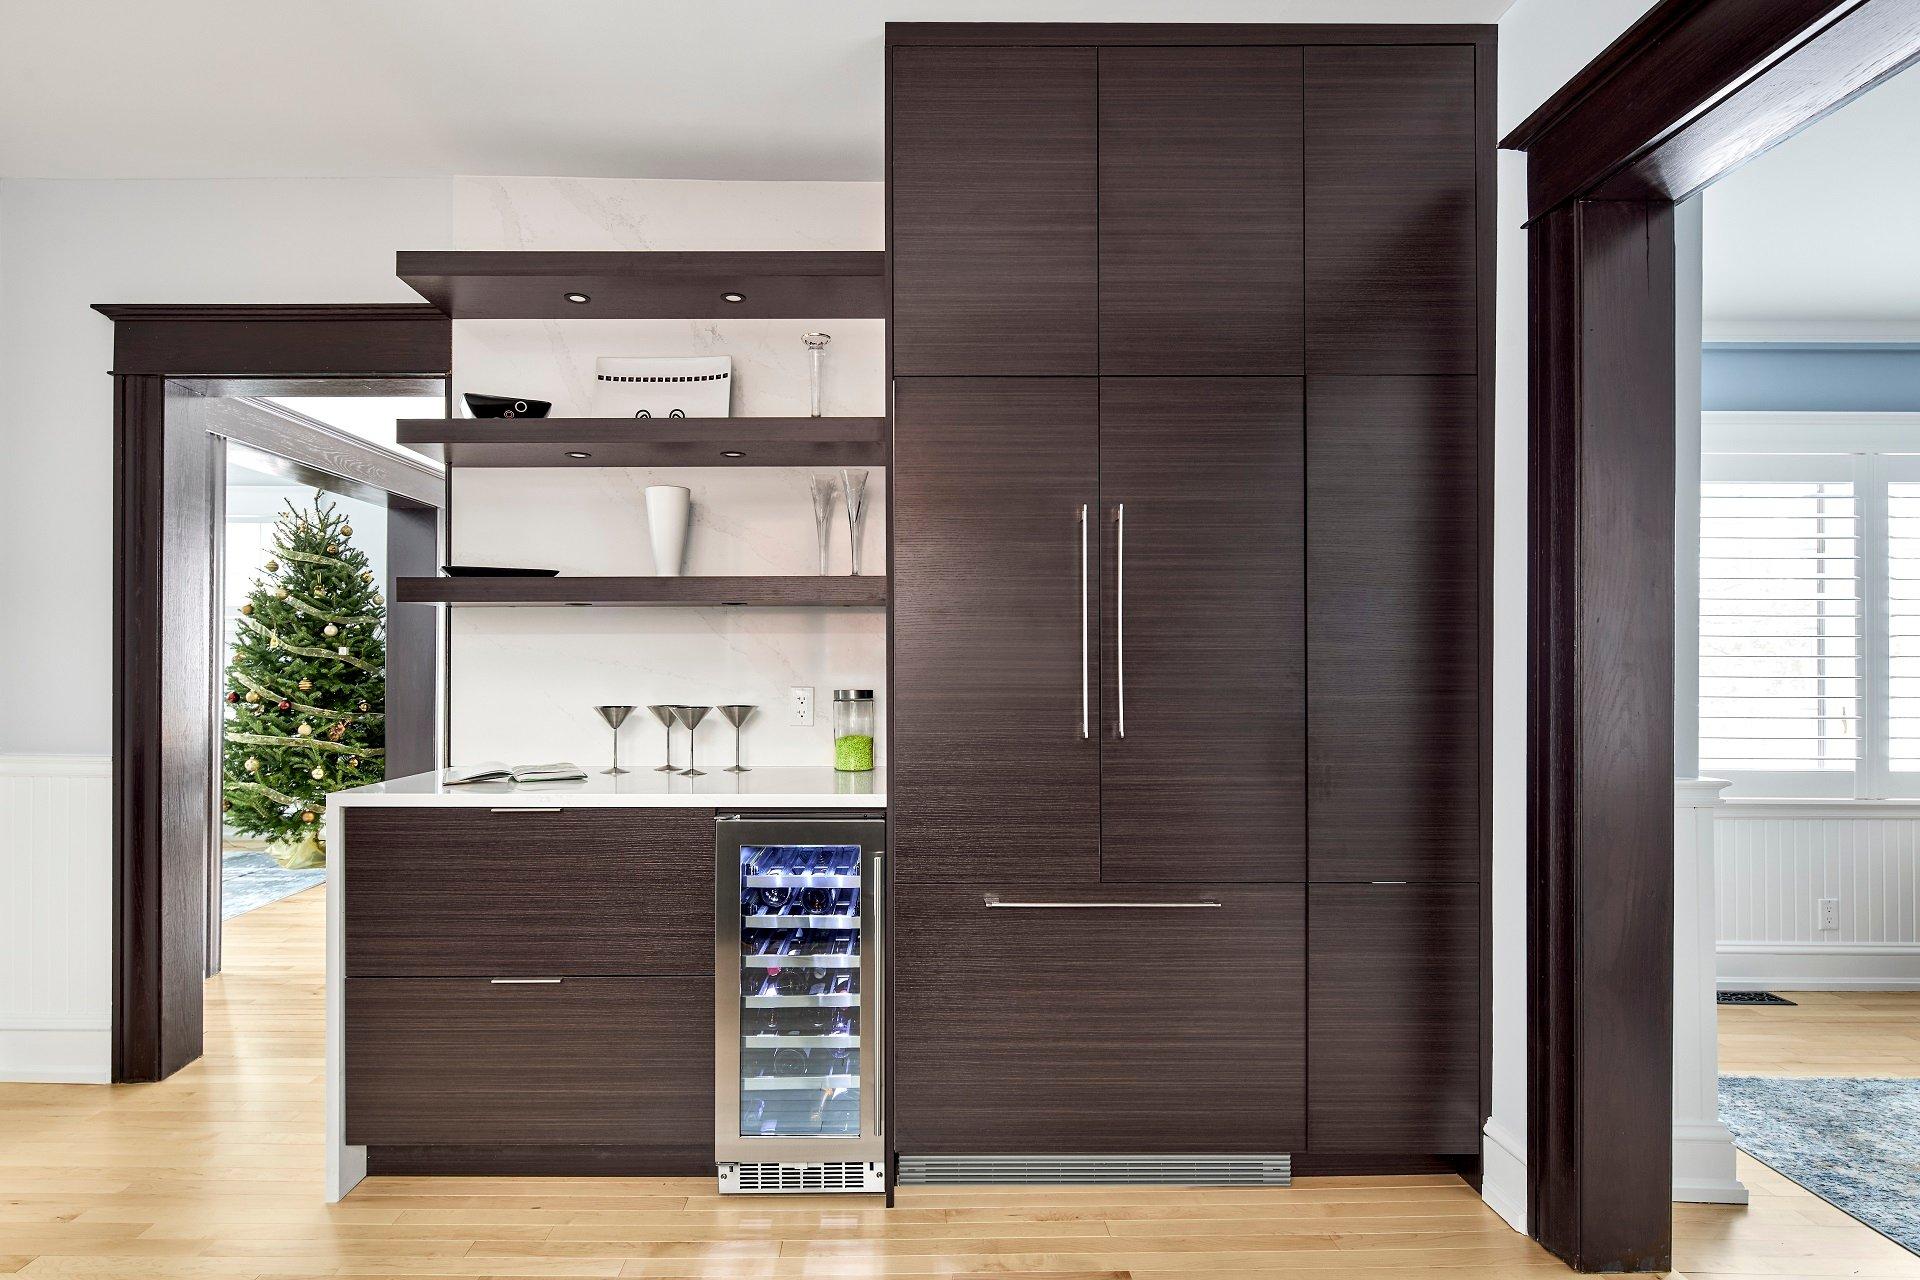 An integrated fridge in a kitchen design